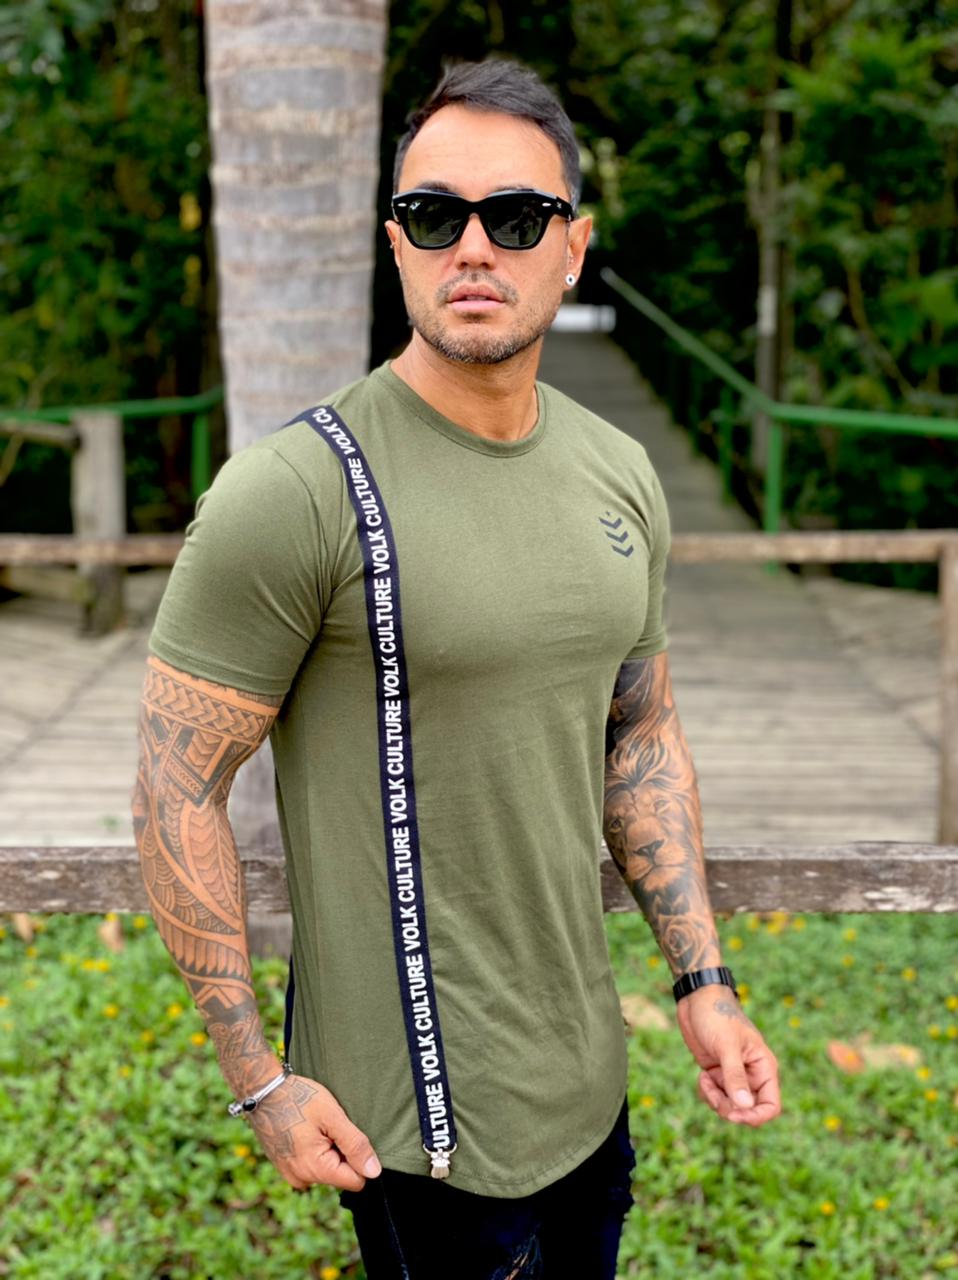 Camiseta Verde Militar Suspensório Long  Line Premium Volk Culture  - Harpia Moda - Moda Masculina & Acessórios